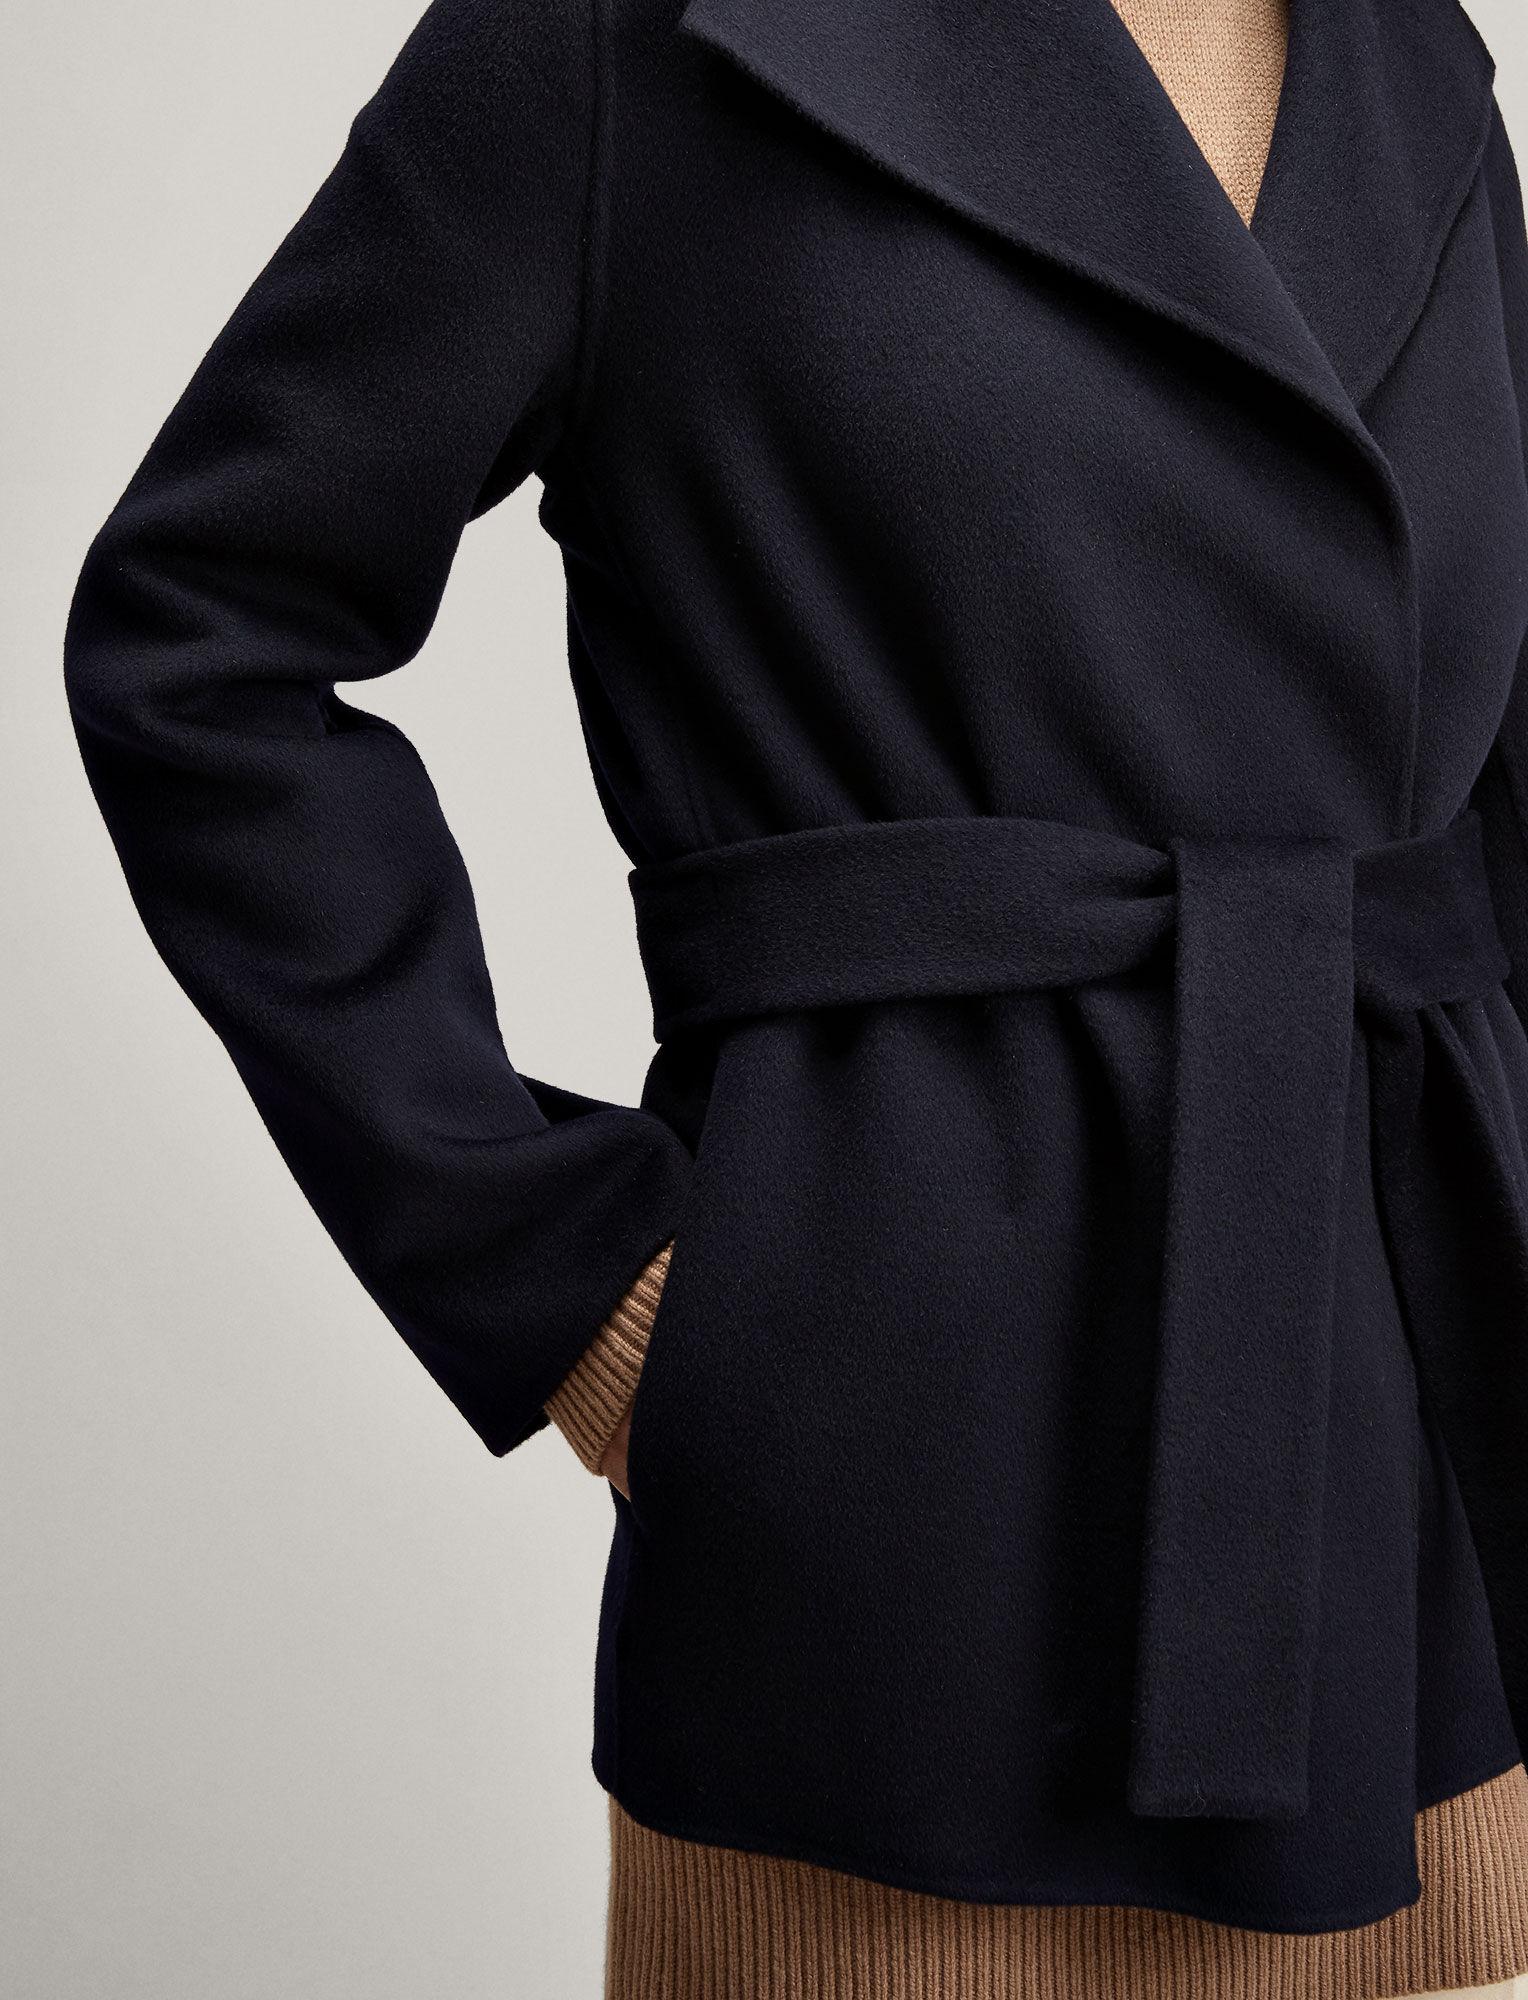 Joseph, Double Face Cashmere Lima Short Coat, in NAVY